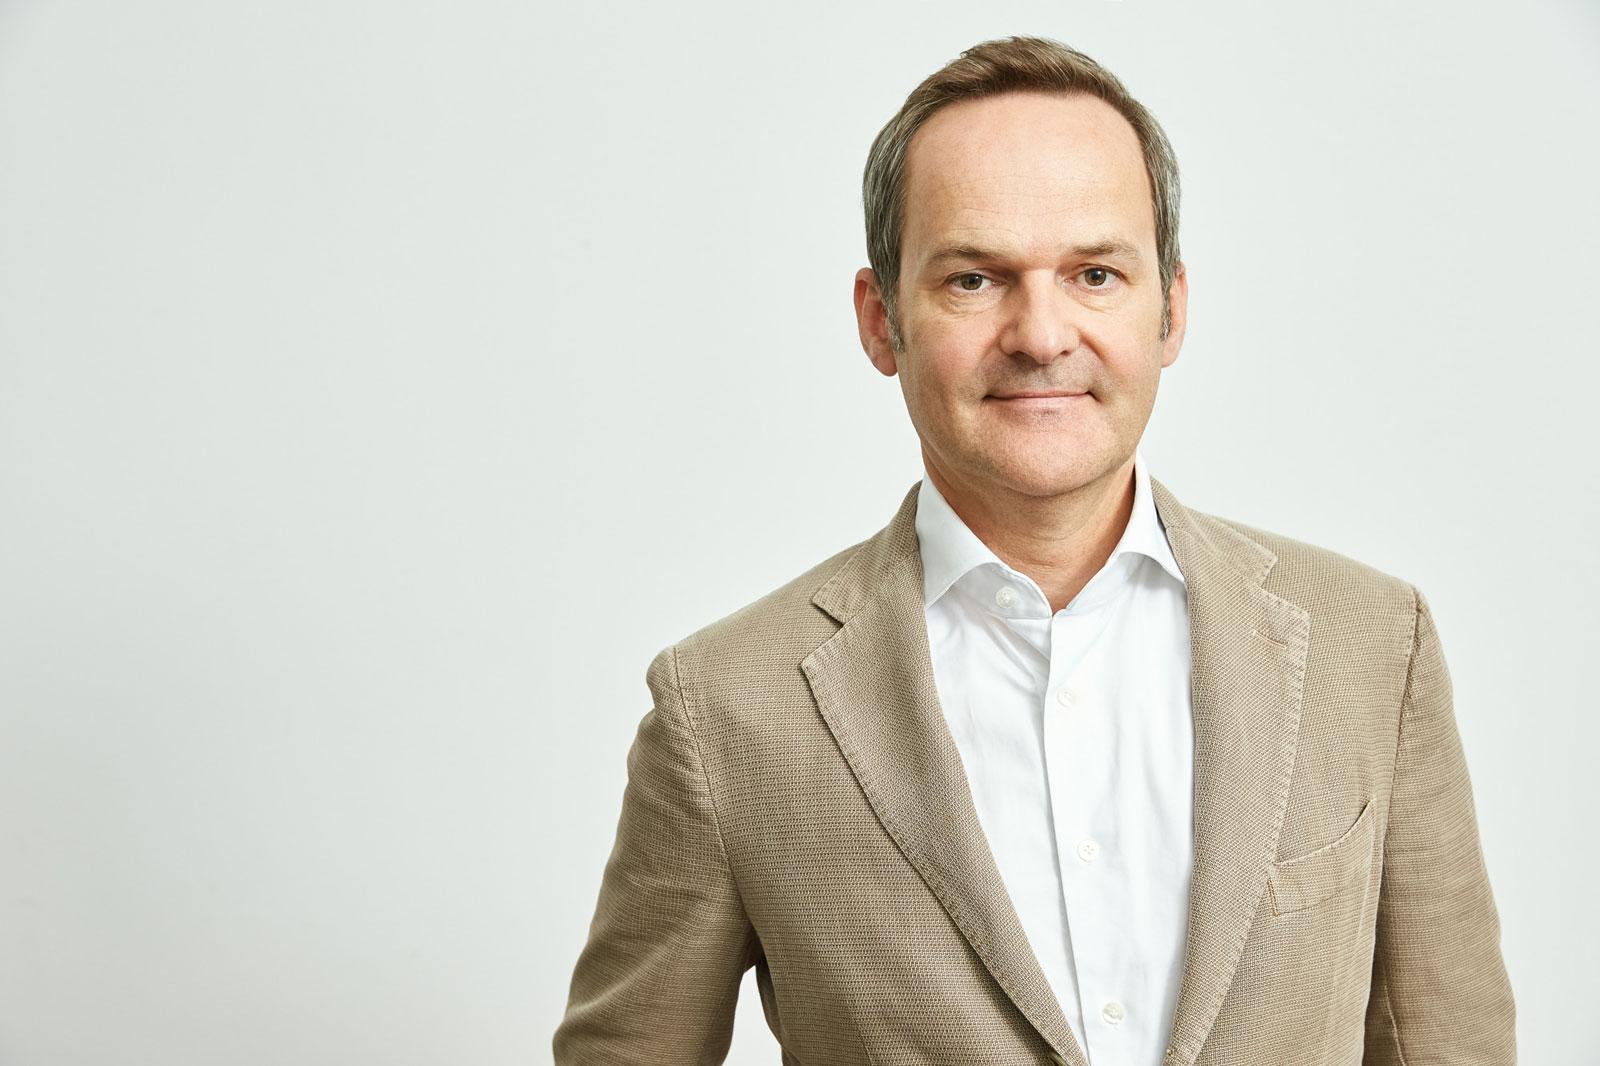 Dr. Franz Schellhorn